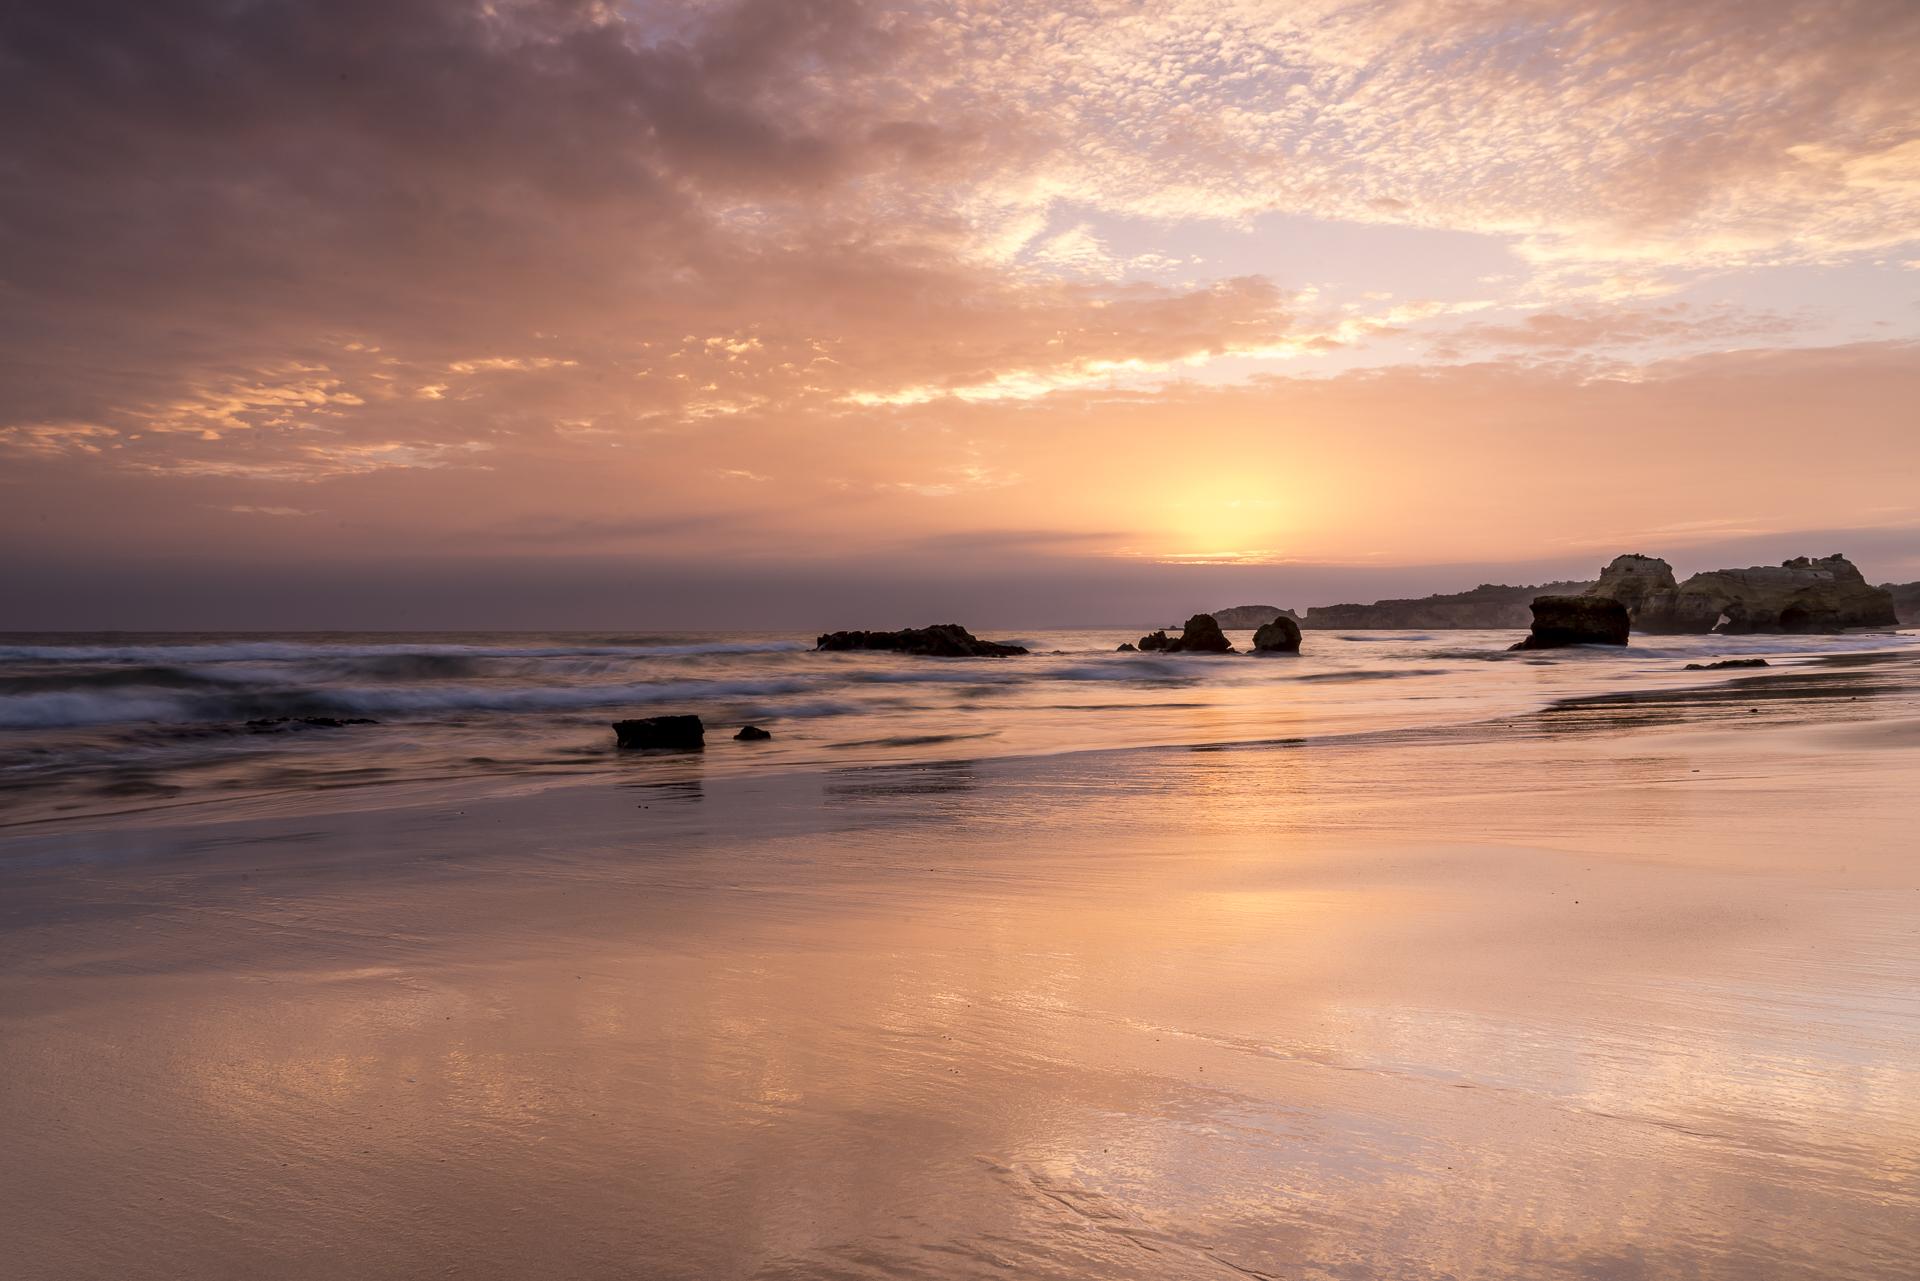 Sonnenuntergang Praia da Rocha